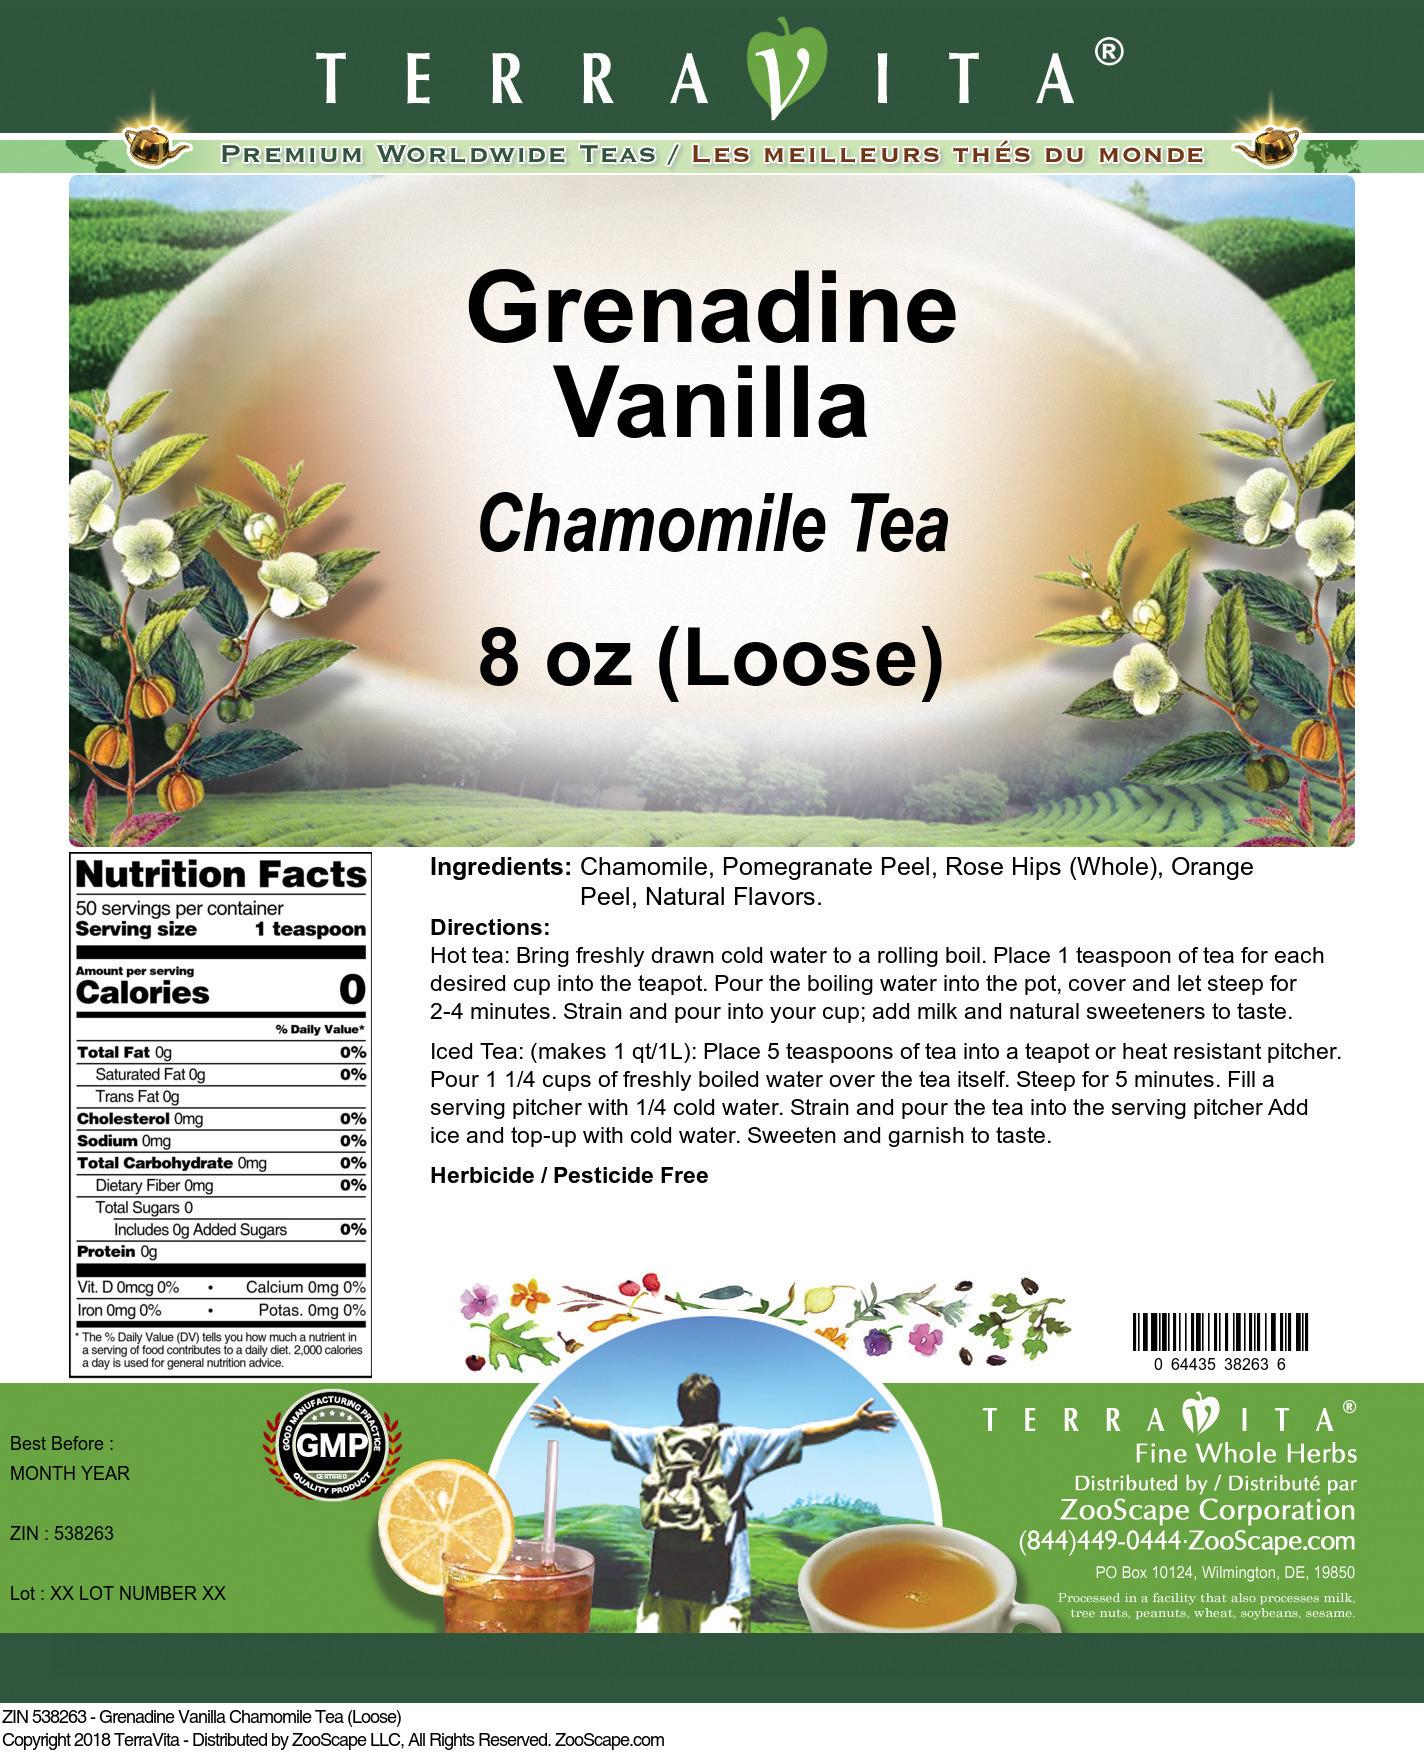 Grenadine Vanilla Chamomile Tea (Loose)